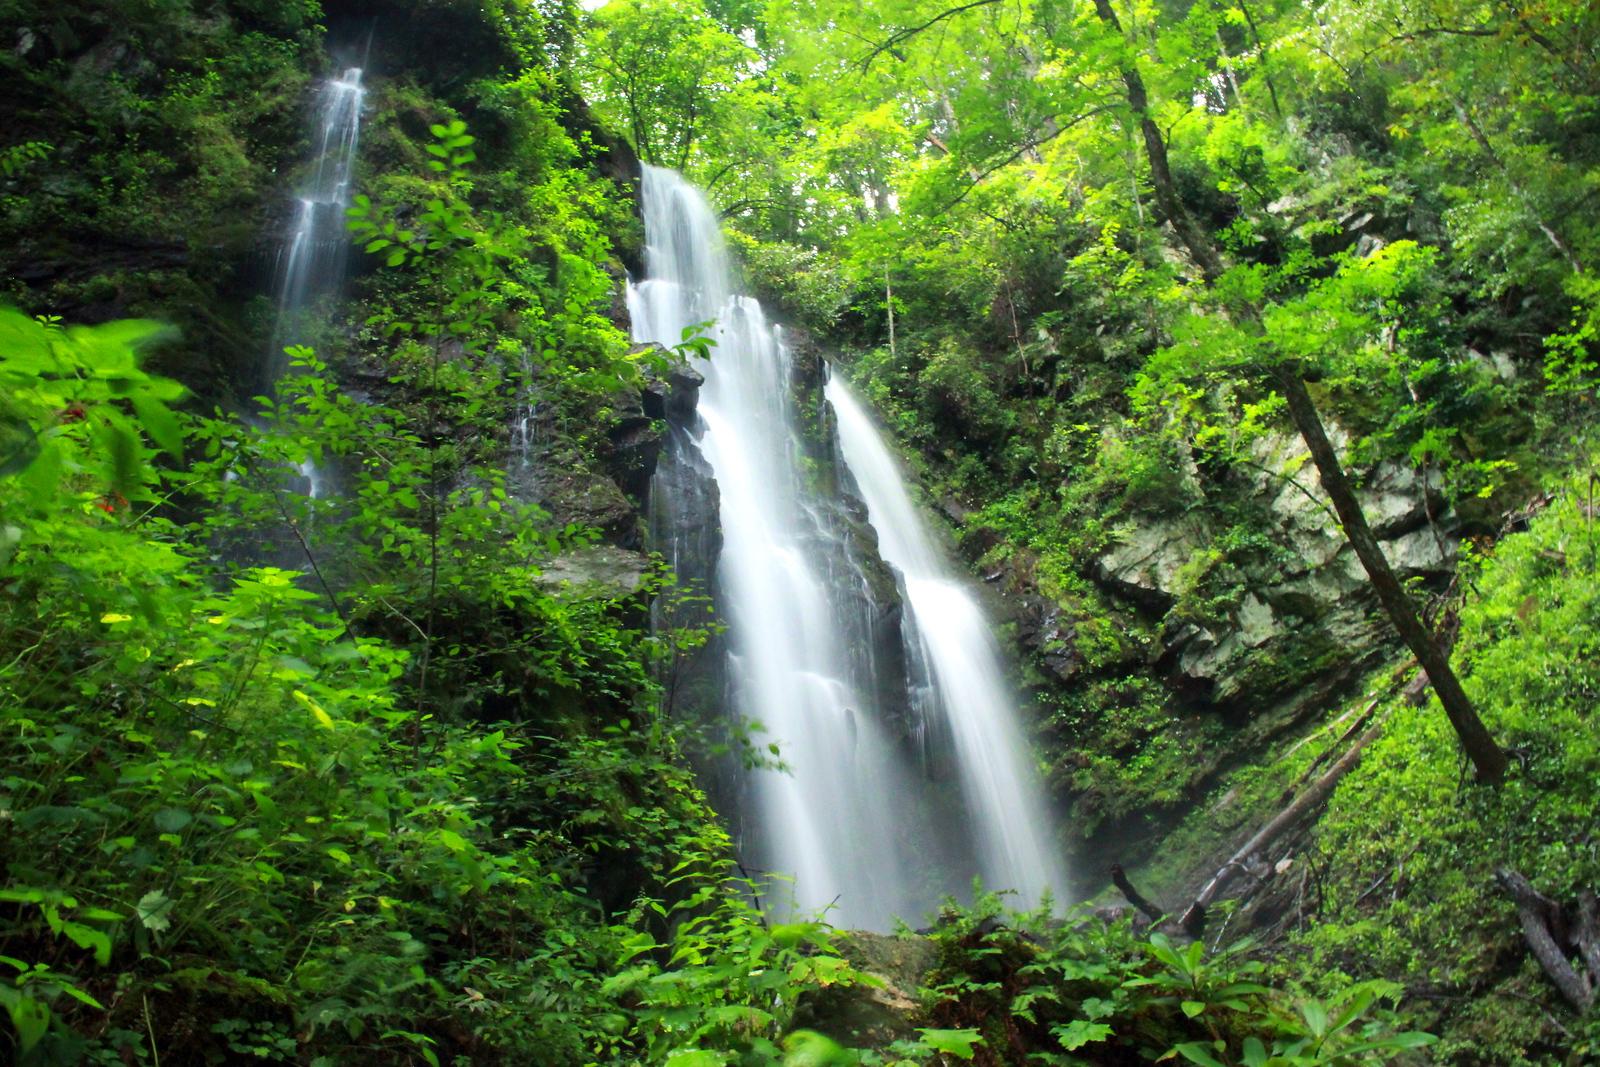 Lee Falls BV High Flow